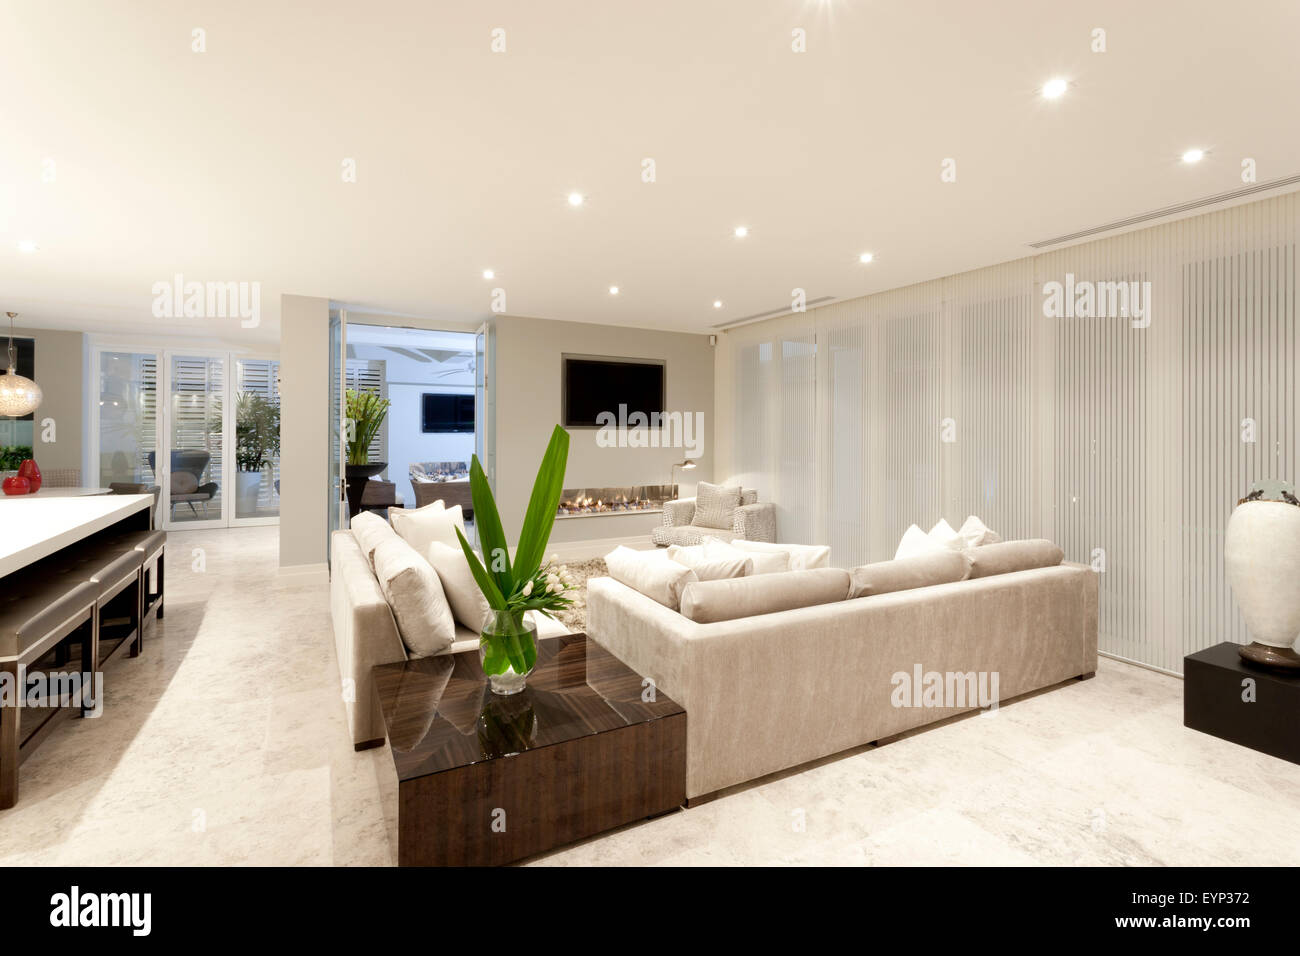 Spacious living room with gray sofas and beautiful lighting Stock ...